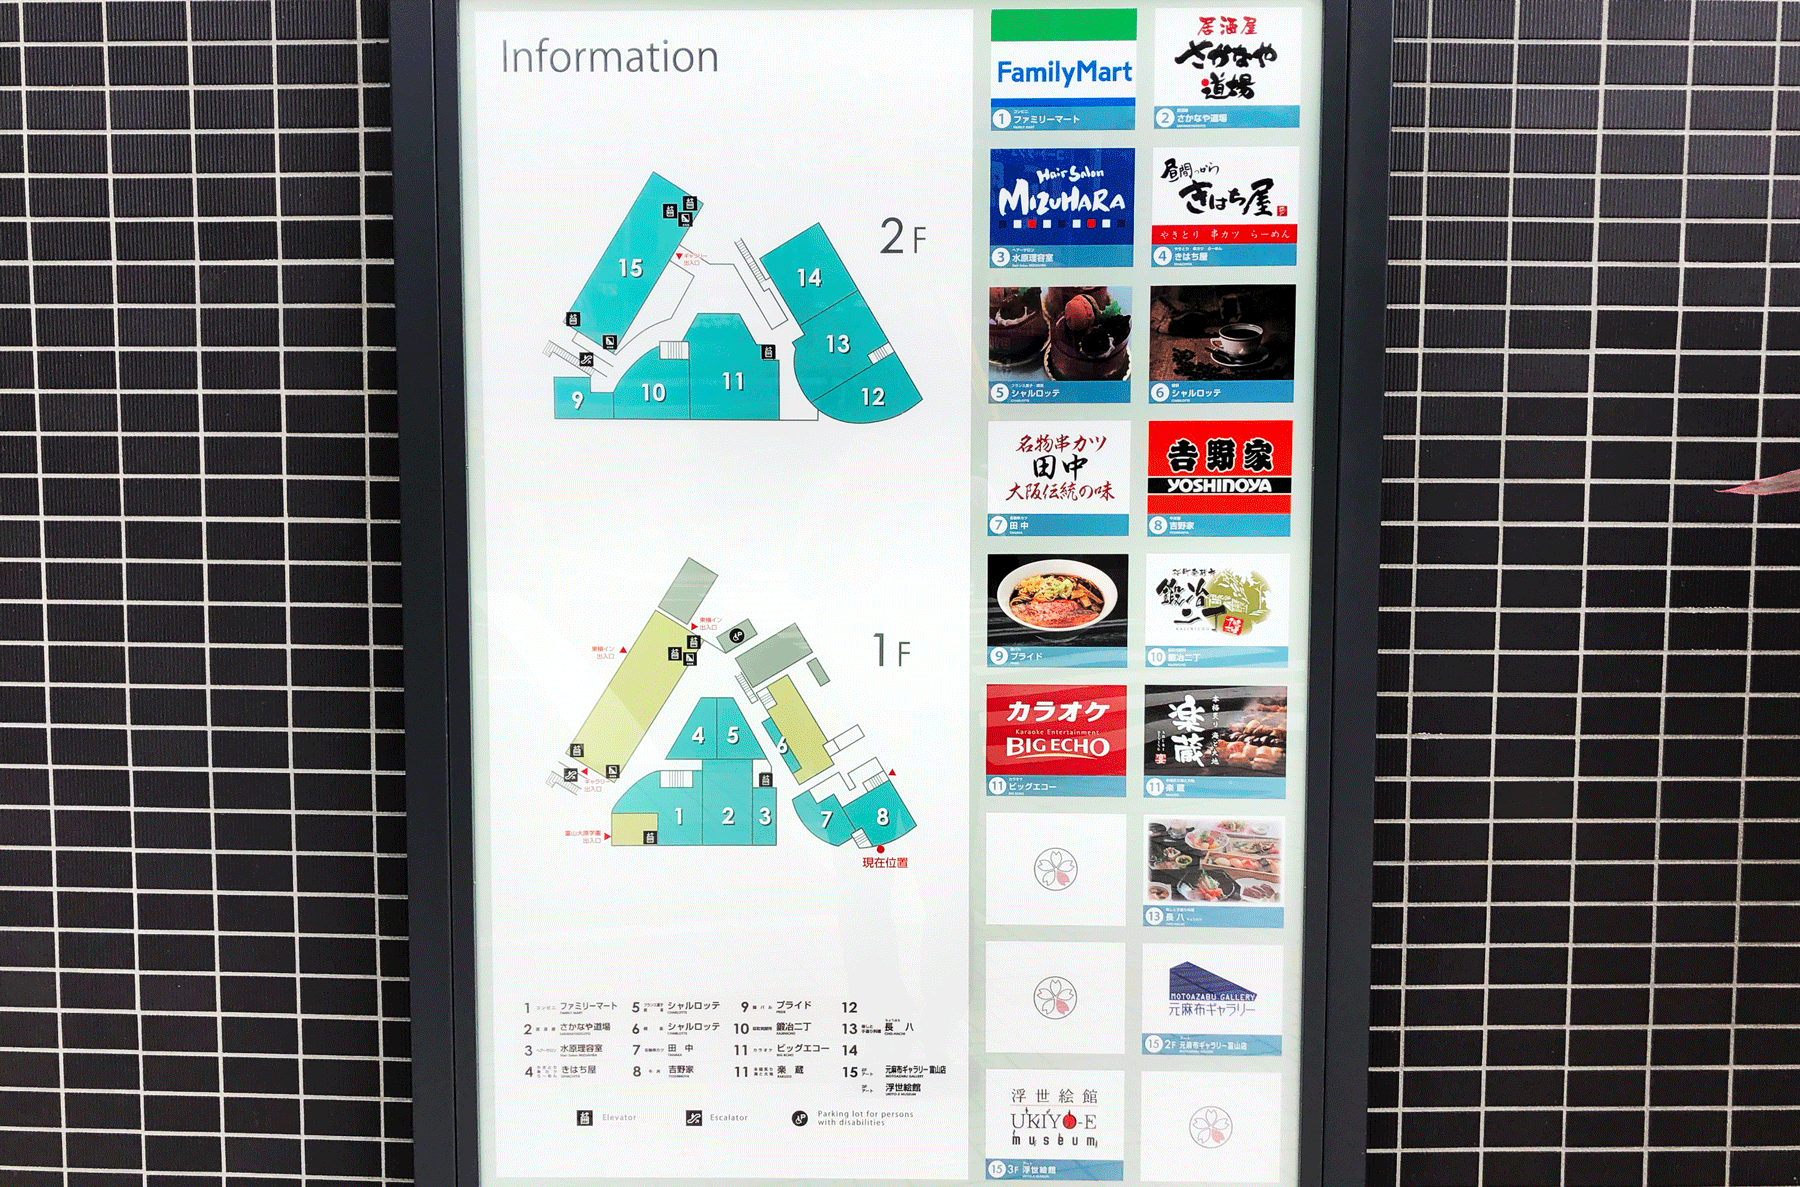 PATIO SAKURA(パティオさくら)の全体マップ